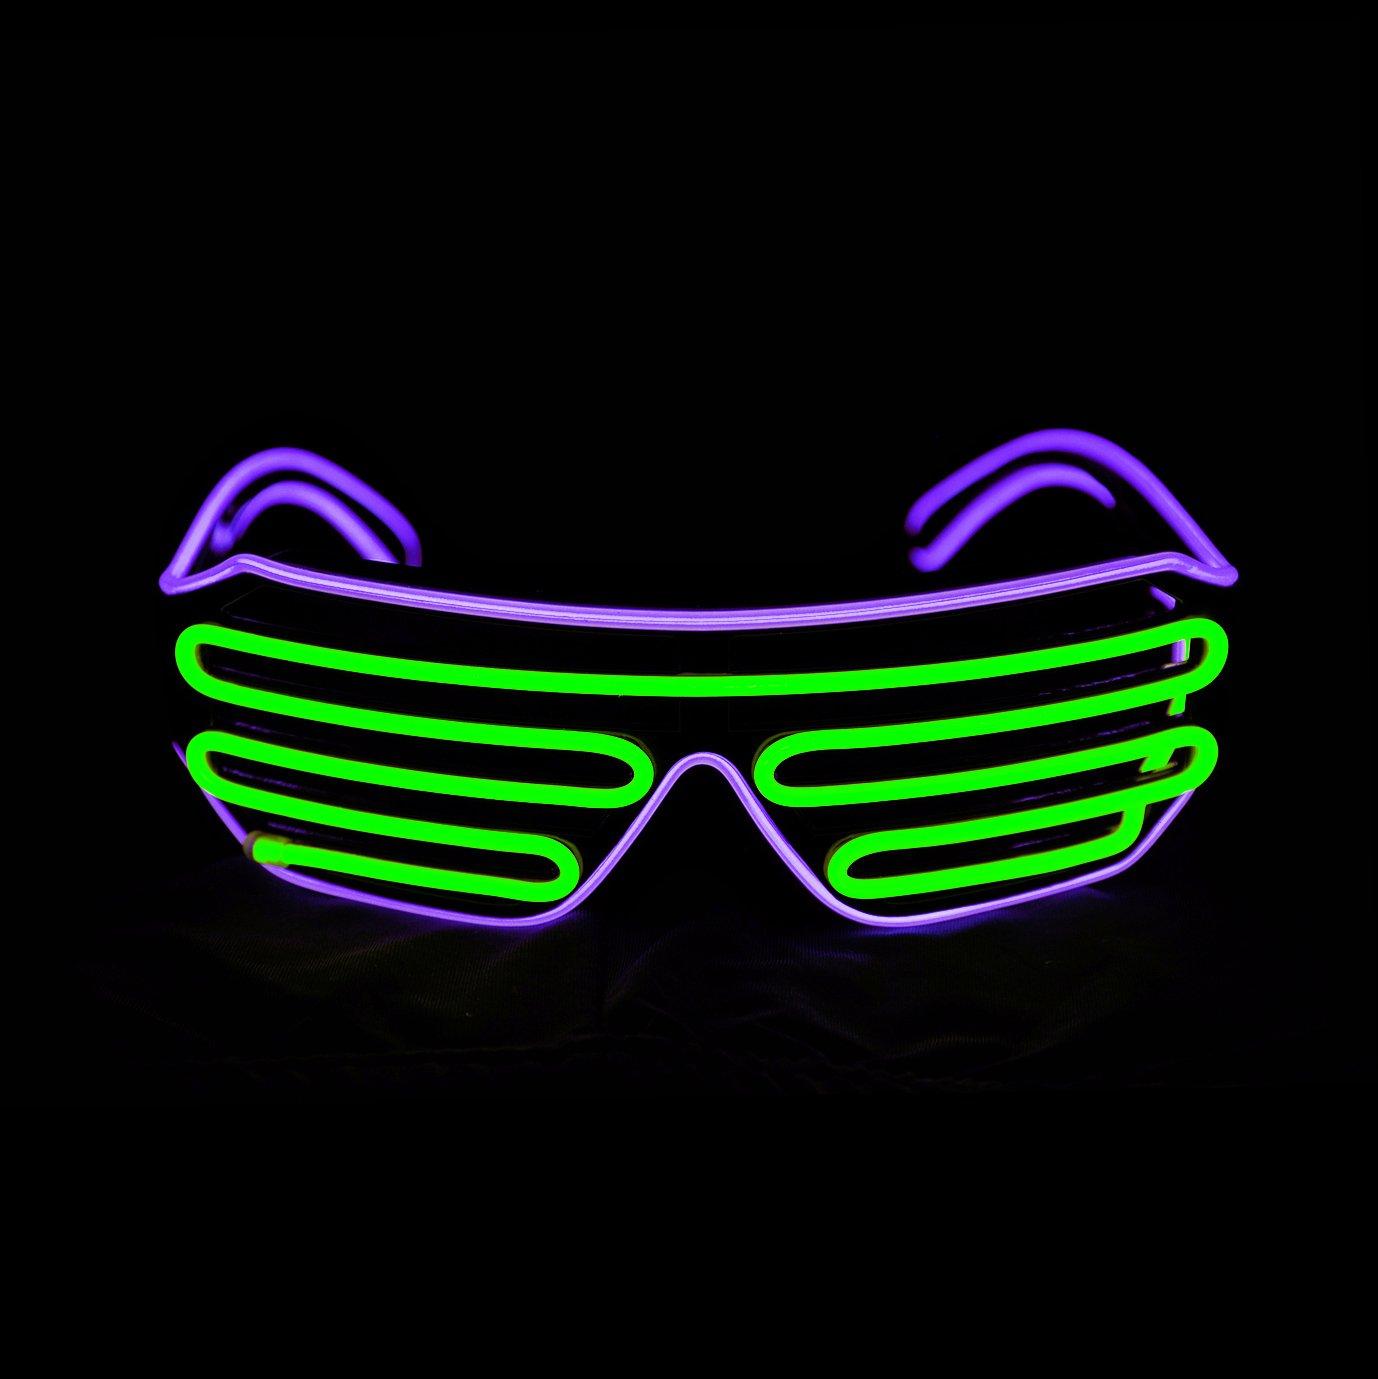 c6b0675568 PINFOX Shutter EL Wire Neon Rave Glasses Flashing LED Sunglasses Light Up  Costumes for 80s